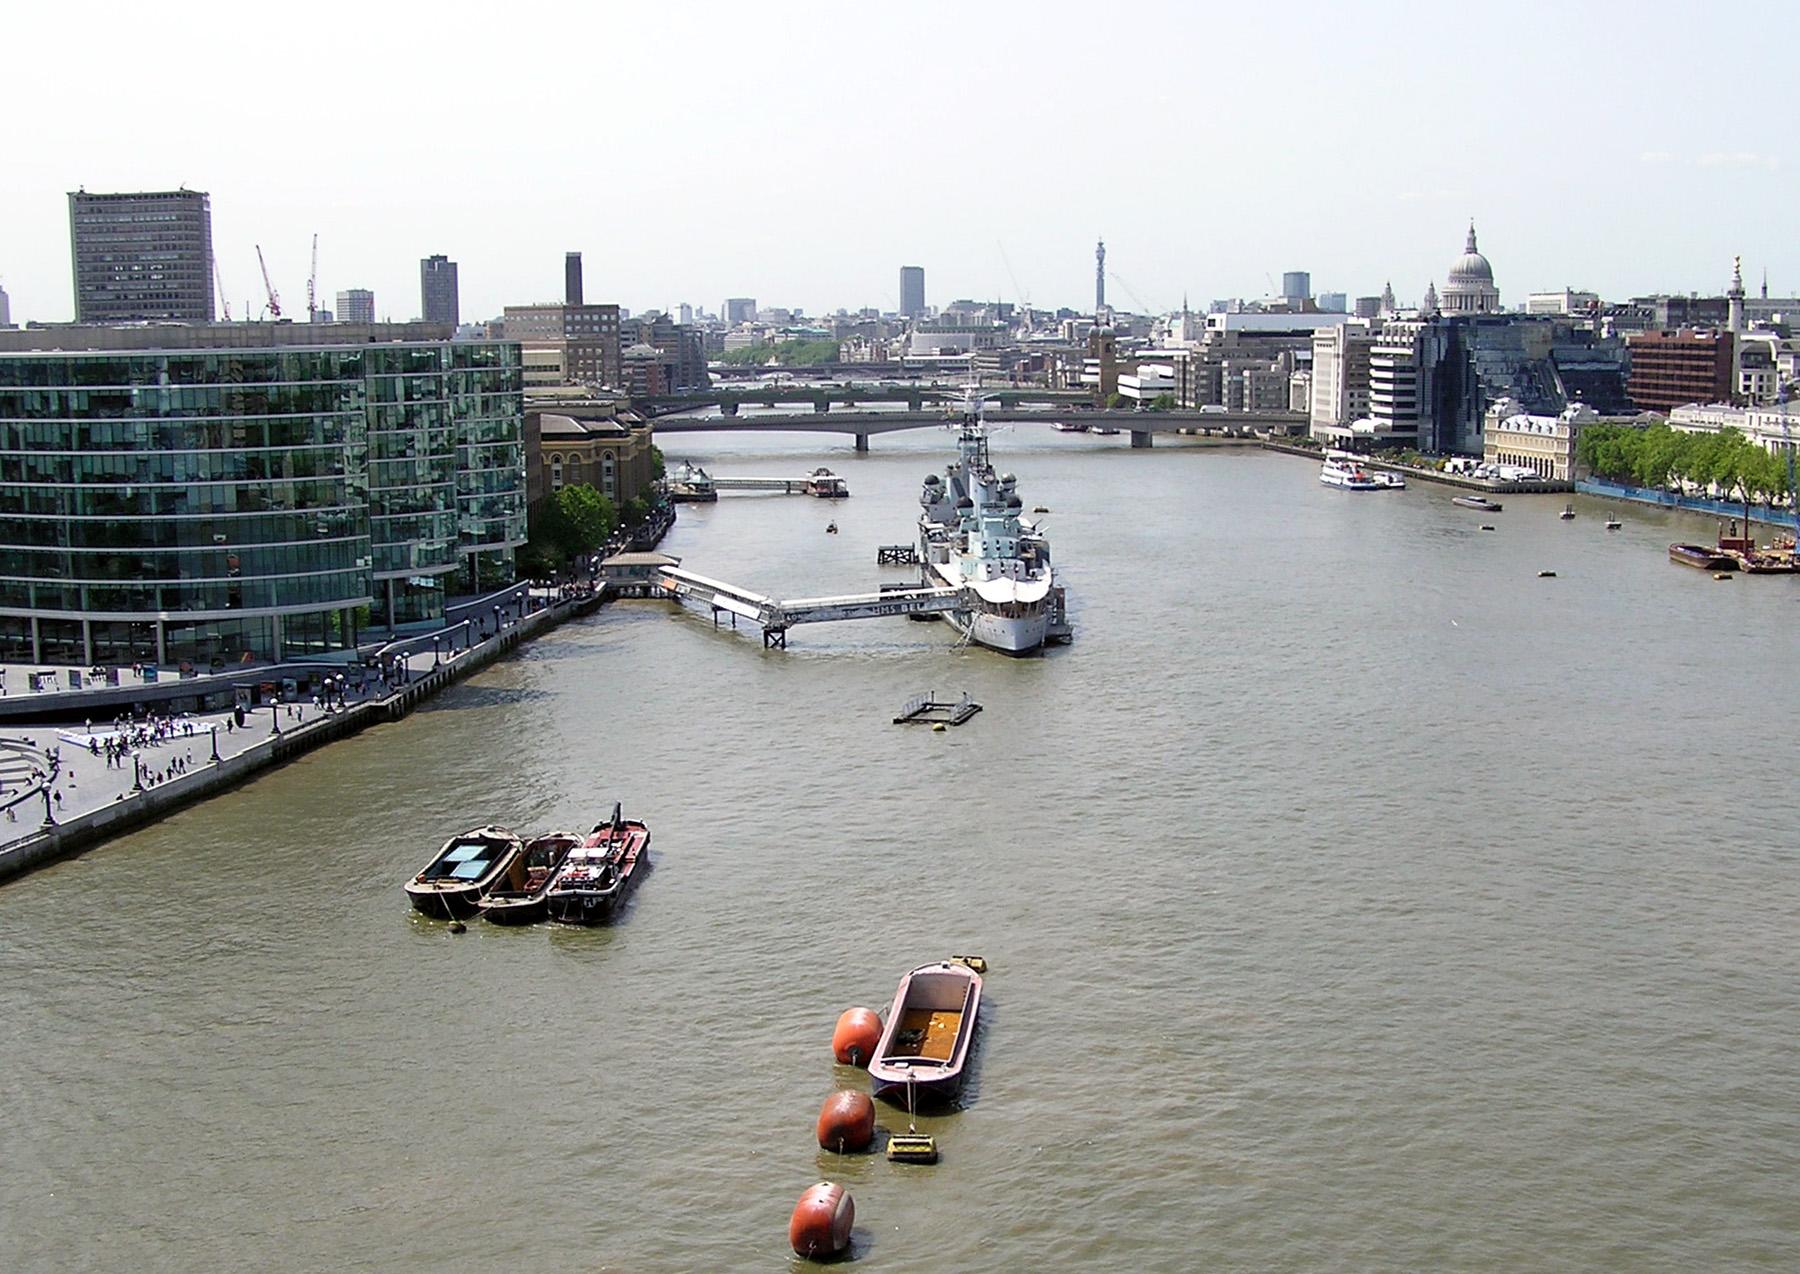 File:River.thames.viewfromtowerbridge.london.arp.jpg - Wikimedia Commons